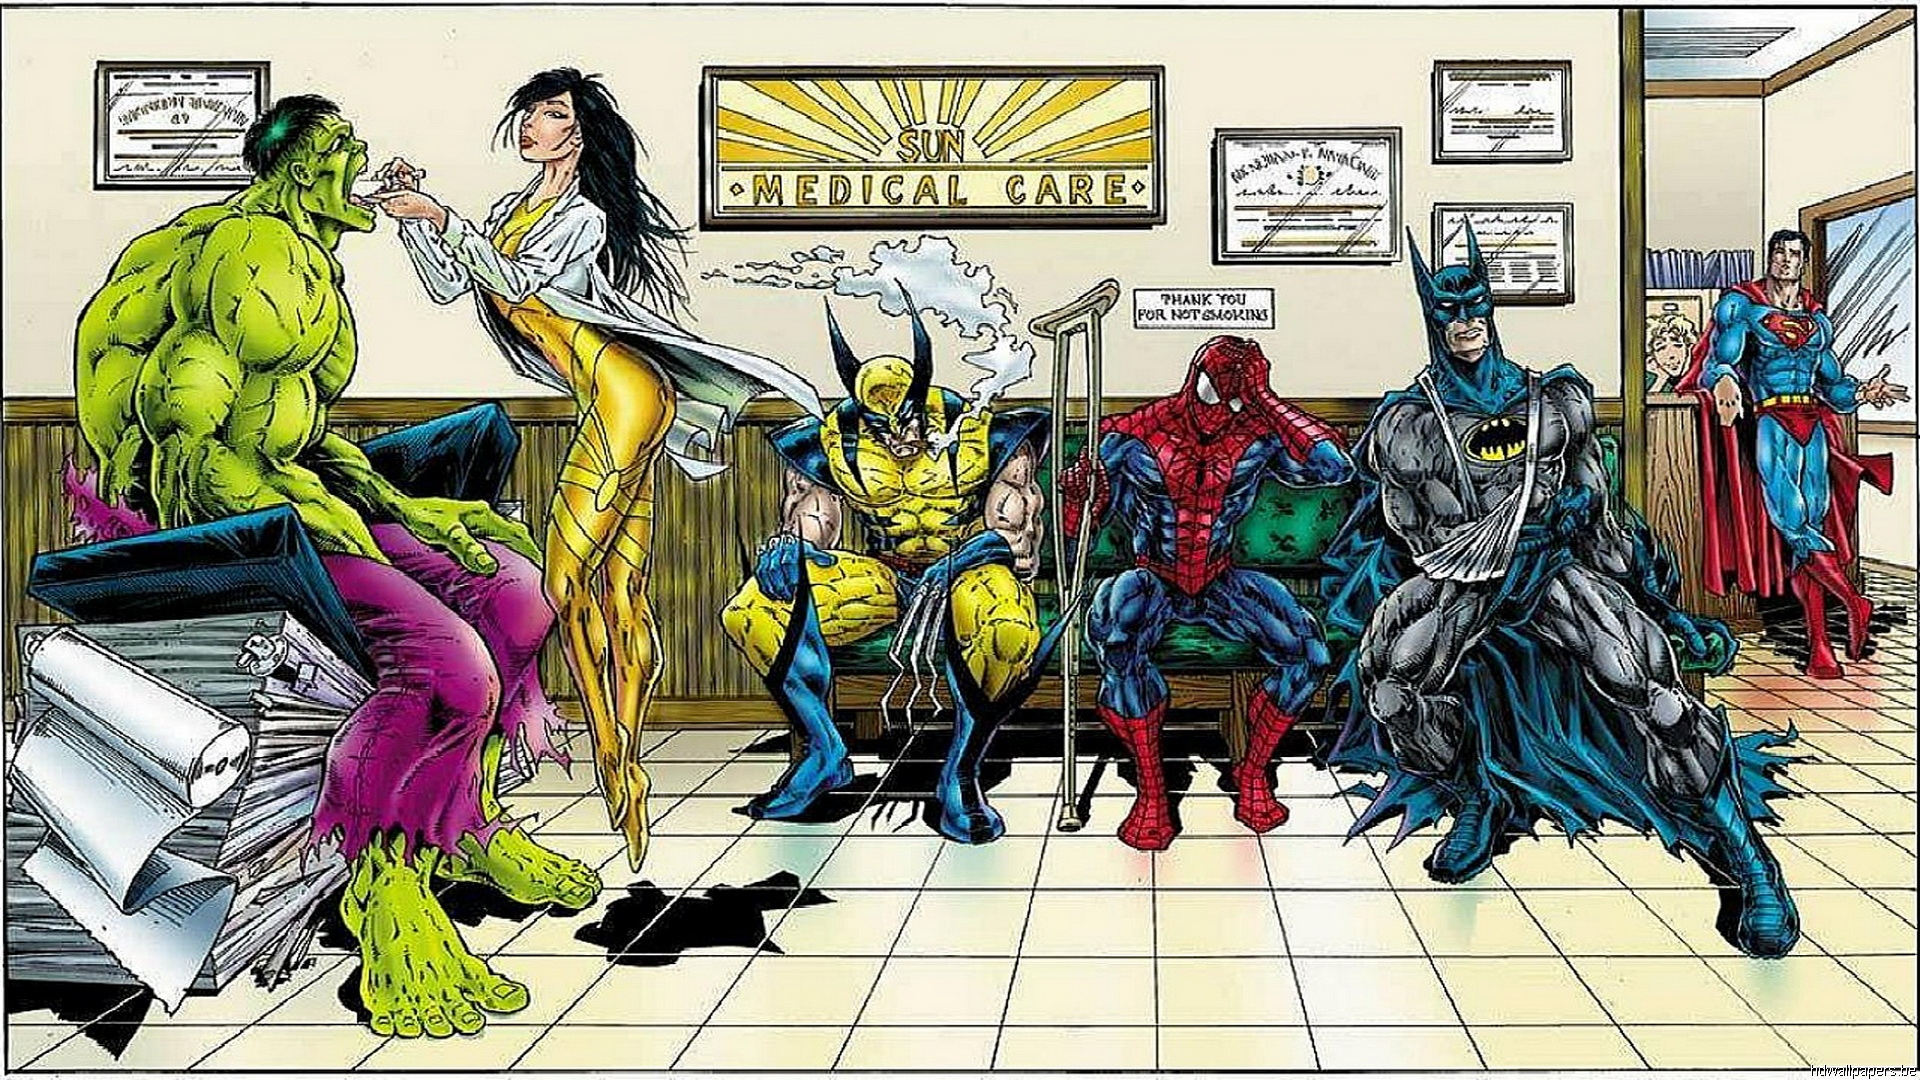 [44+] HD Comic Book Wallpapers on WallpaperSafari